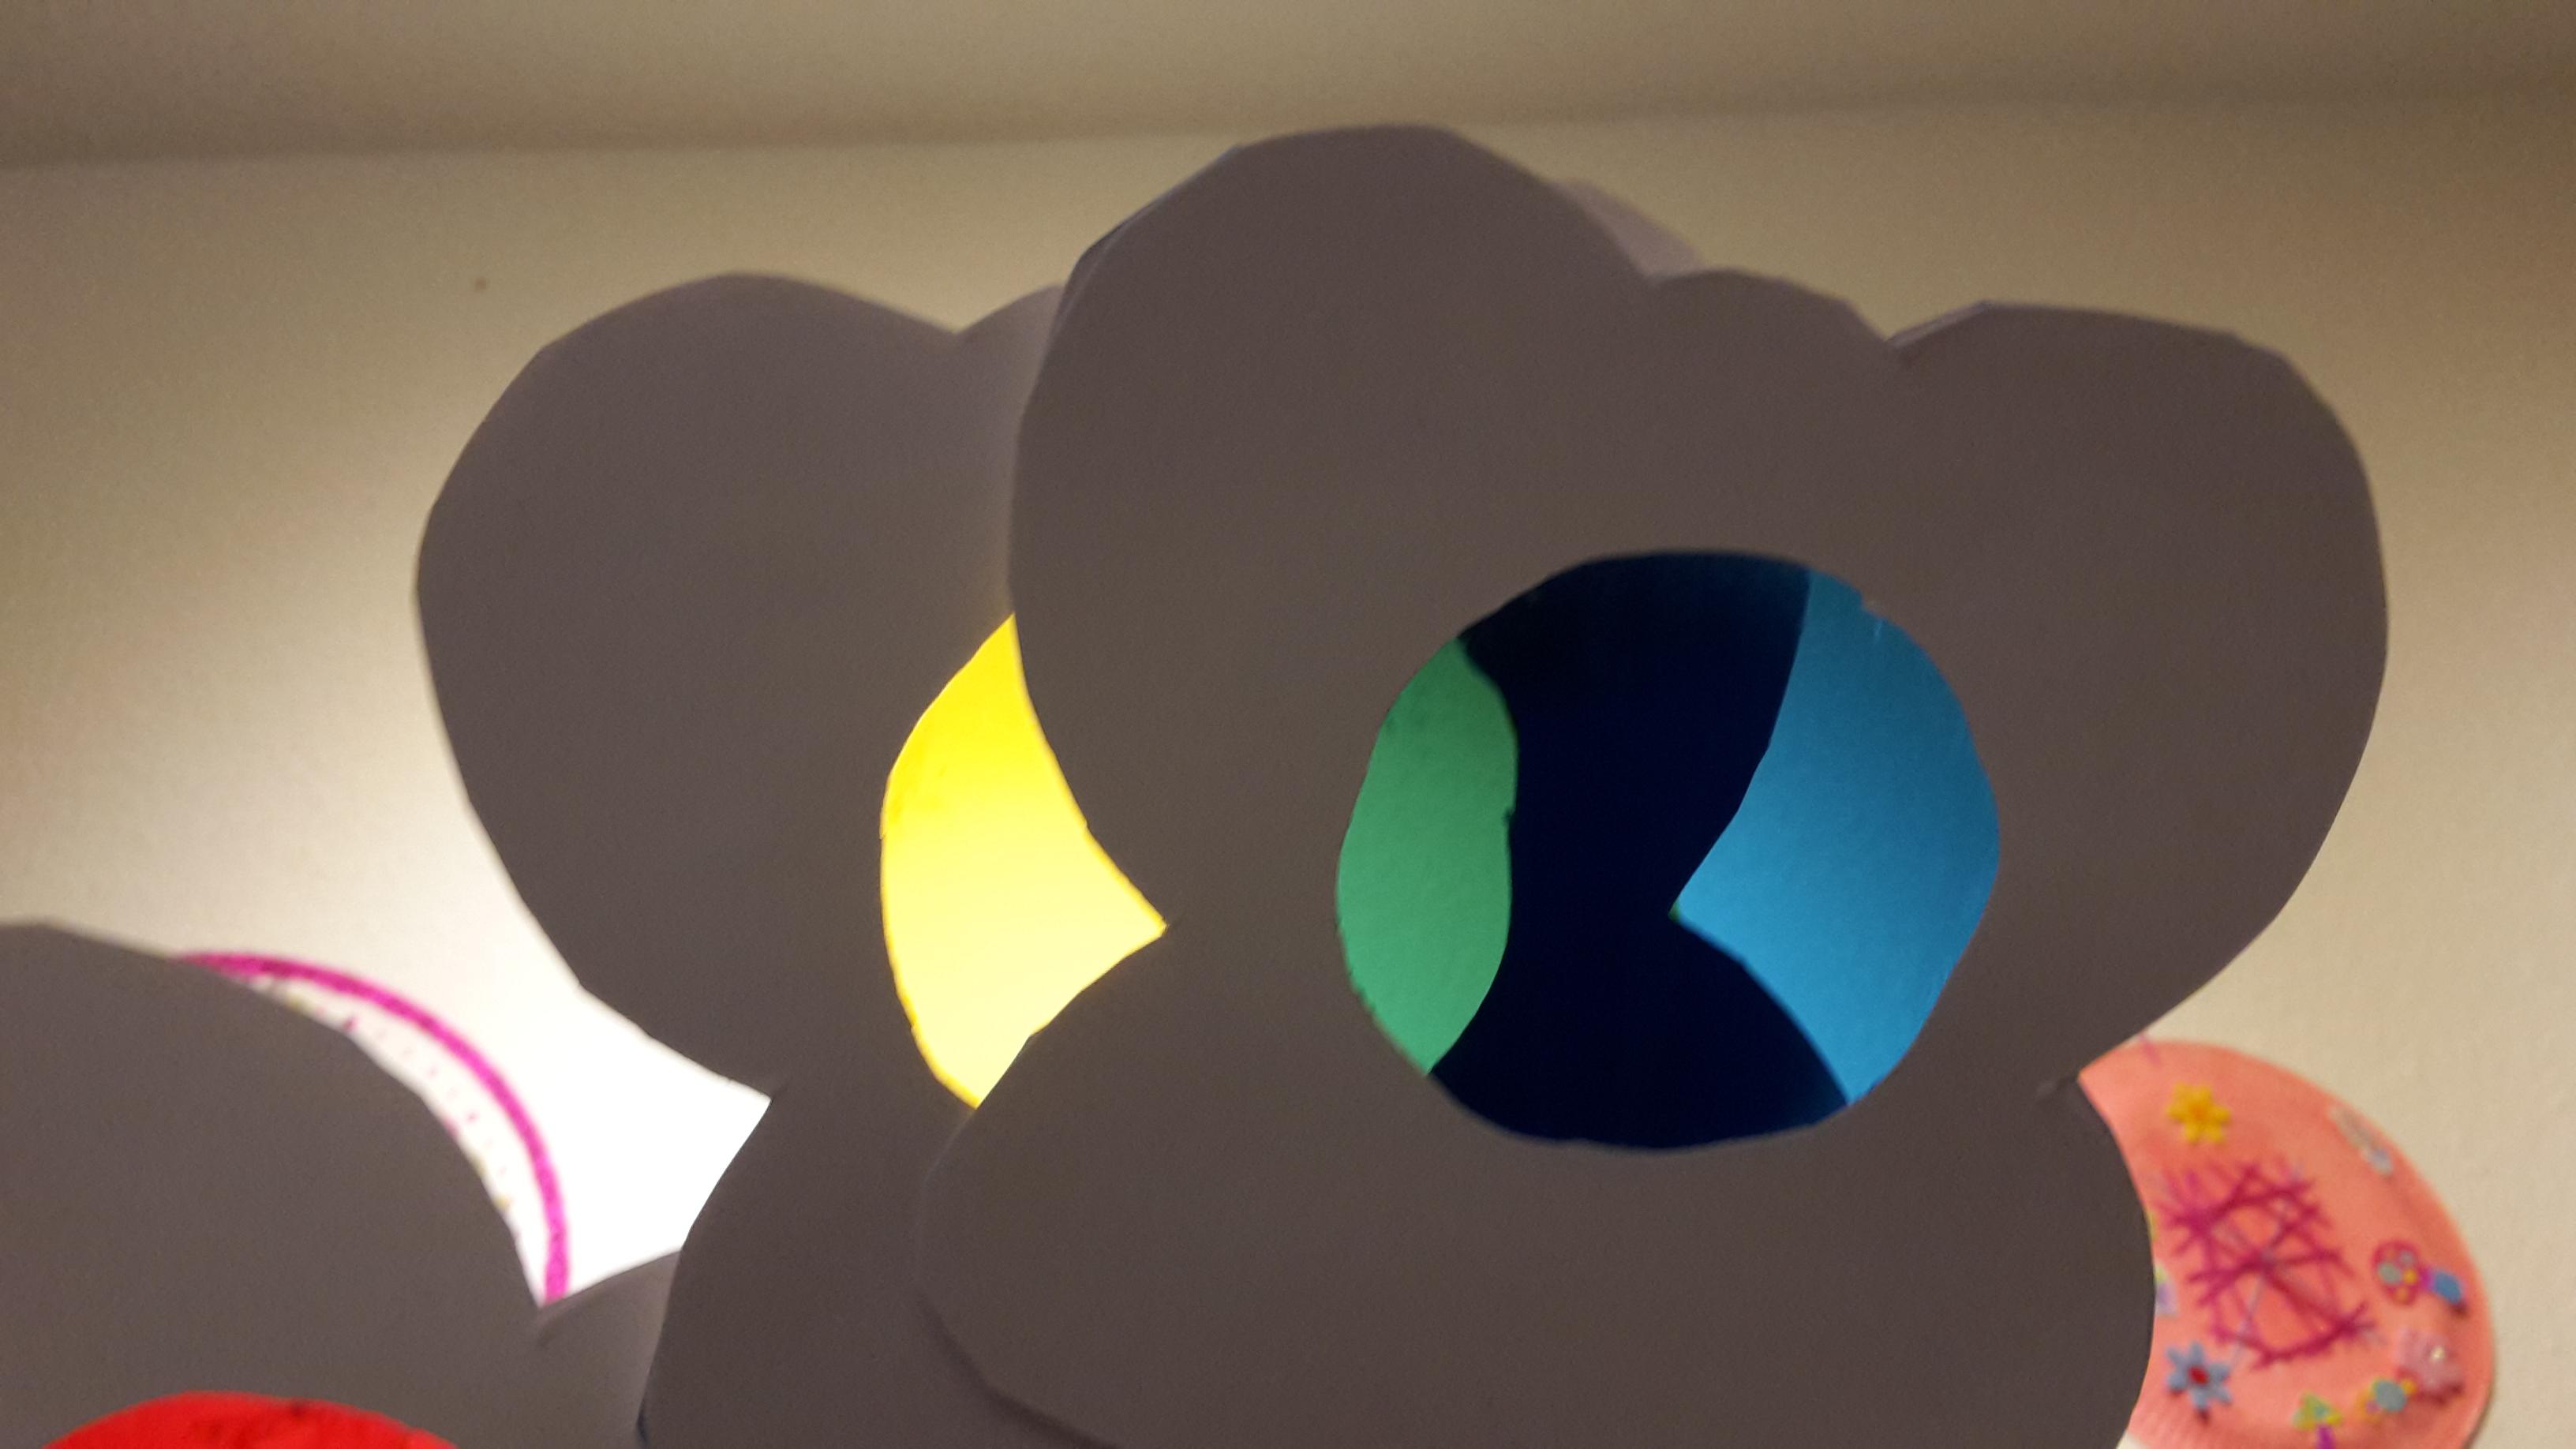 Farbenfächer – Farbenlehre – Experiment